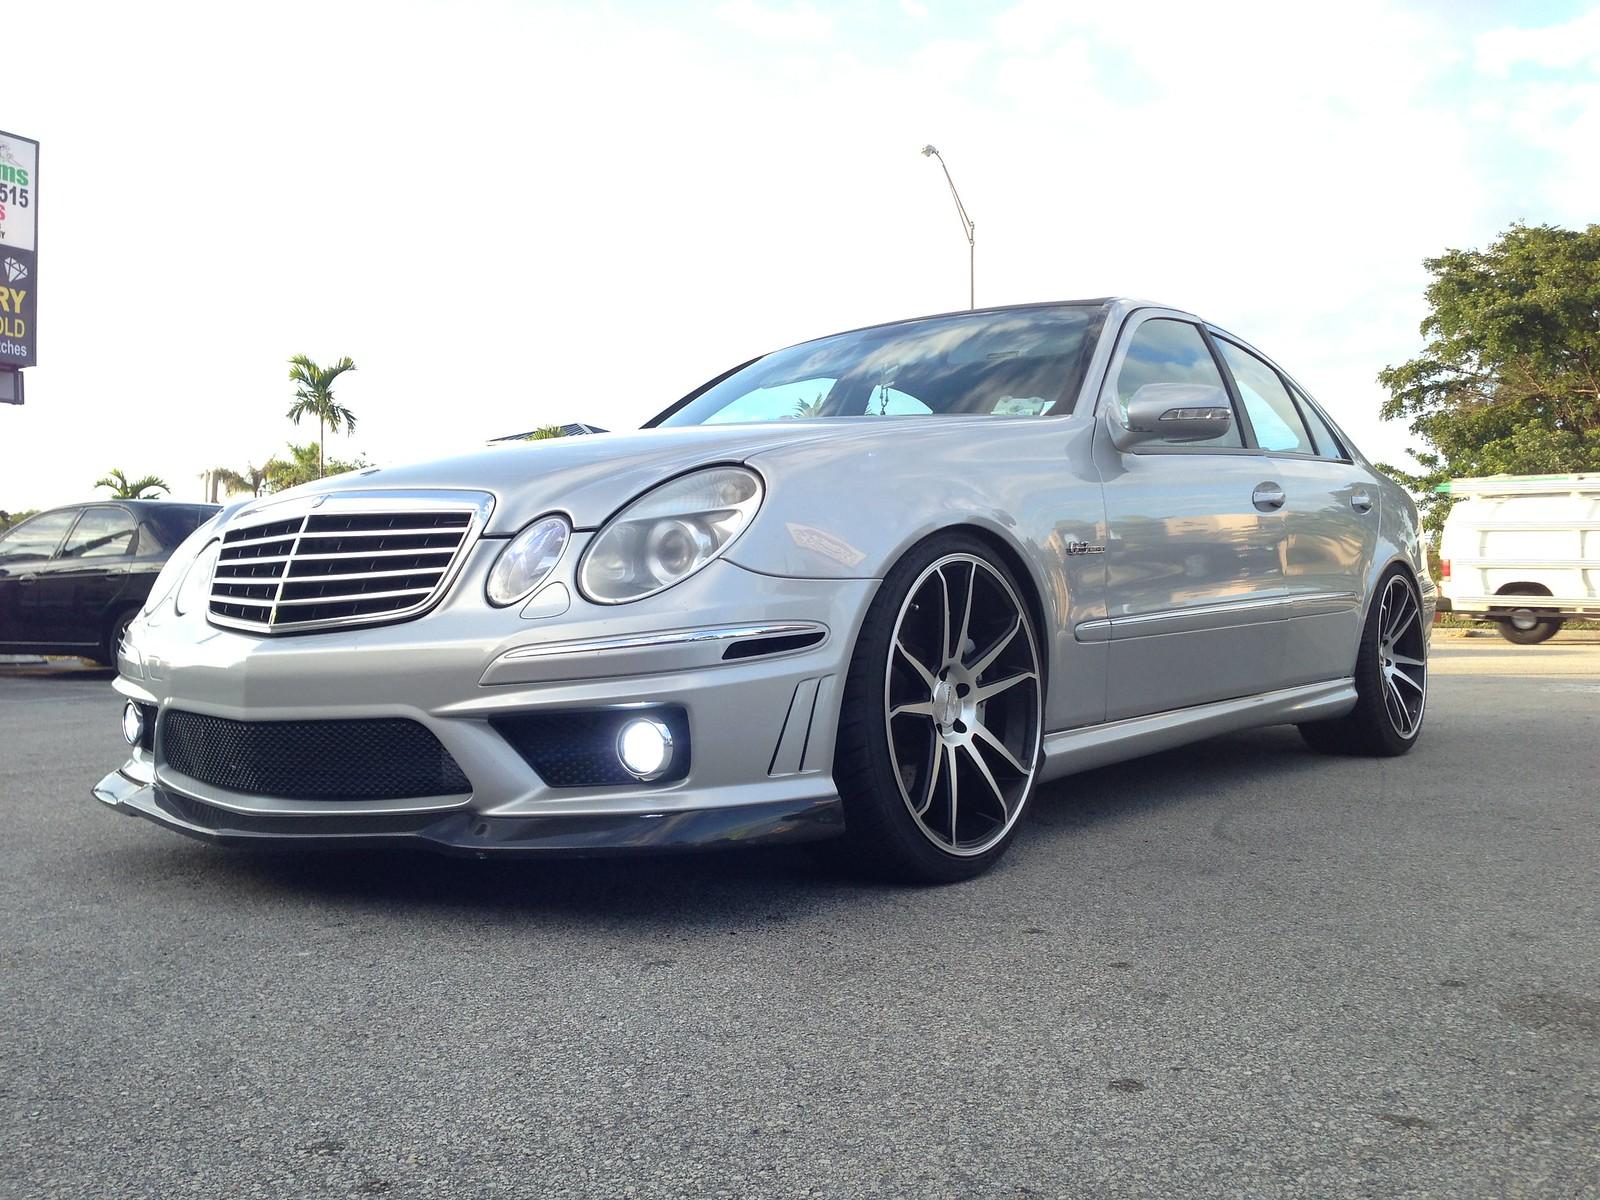 Mercedes e63 facebook giveaway autos post for Mercedes benz giveaway